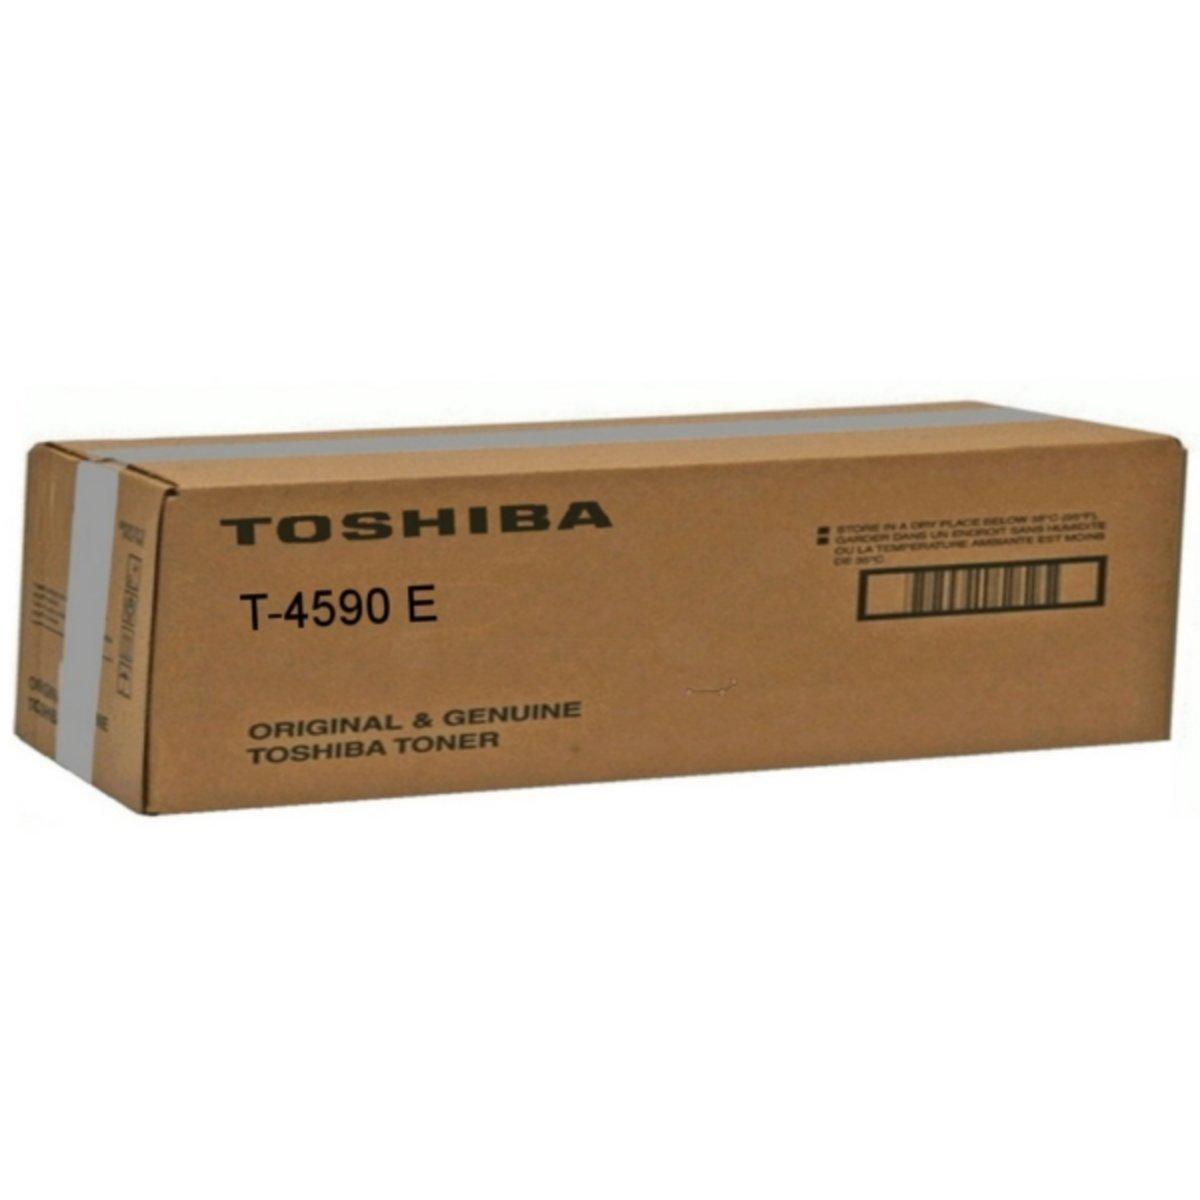 TOSHIBA E STUDIO 306 SE DRIVERS FOR WINDOWS 8